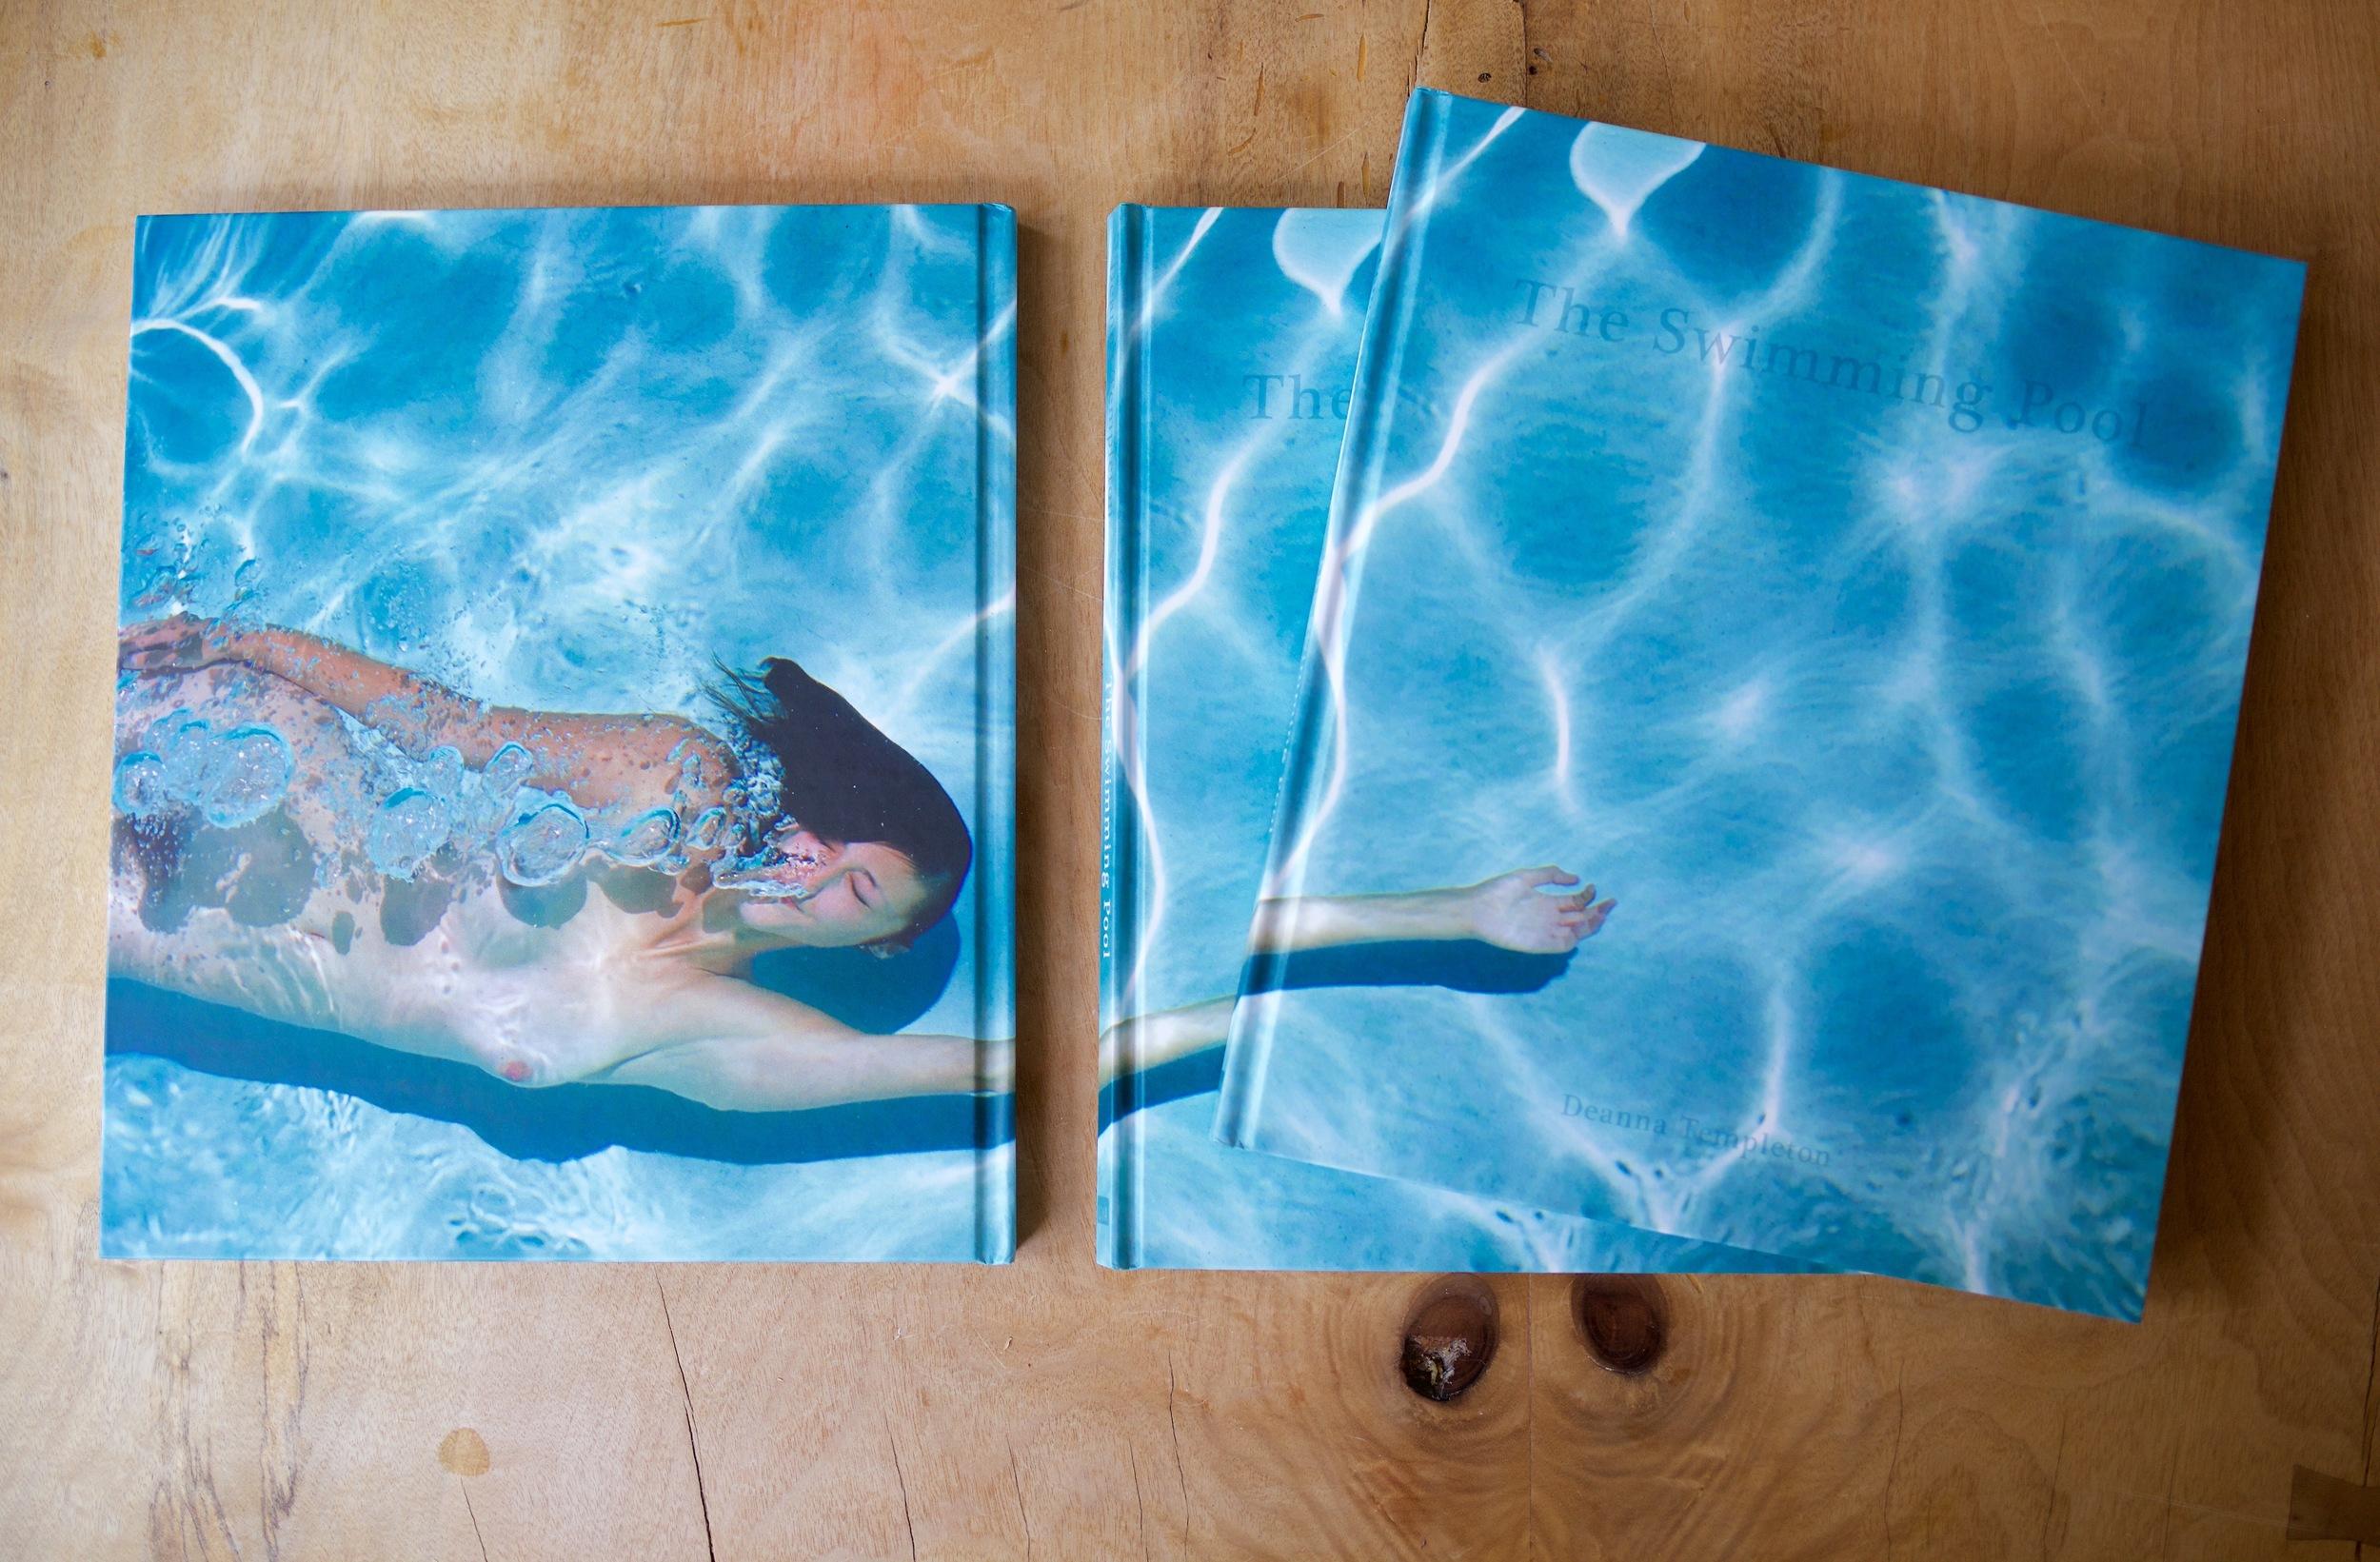 Deanna Templeton: The Swimming Pool — Um Yeah Arts